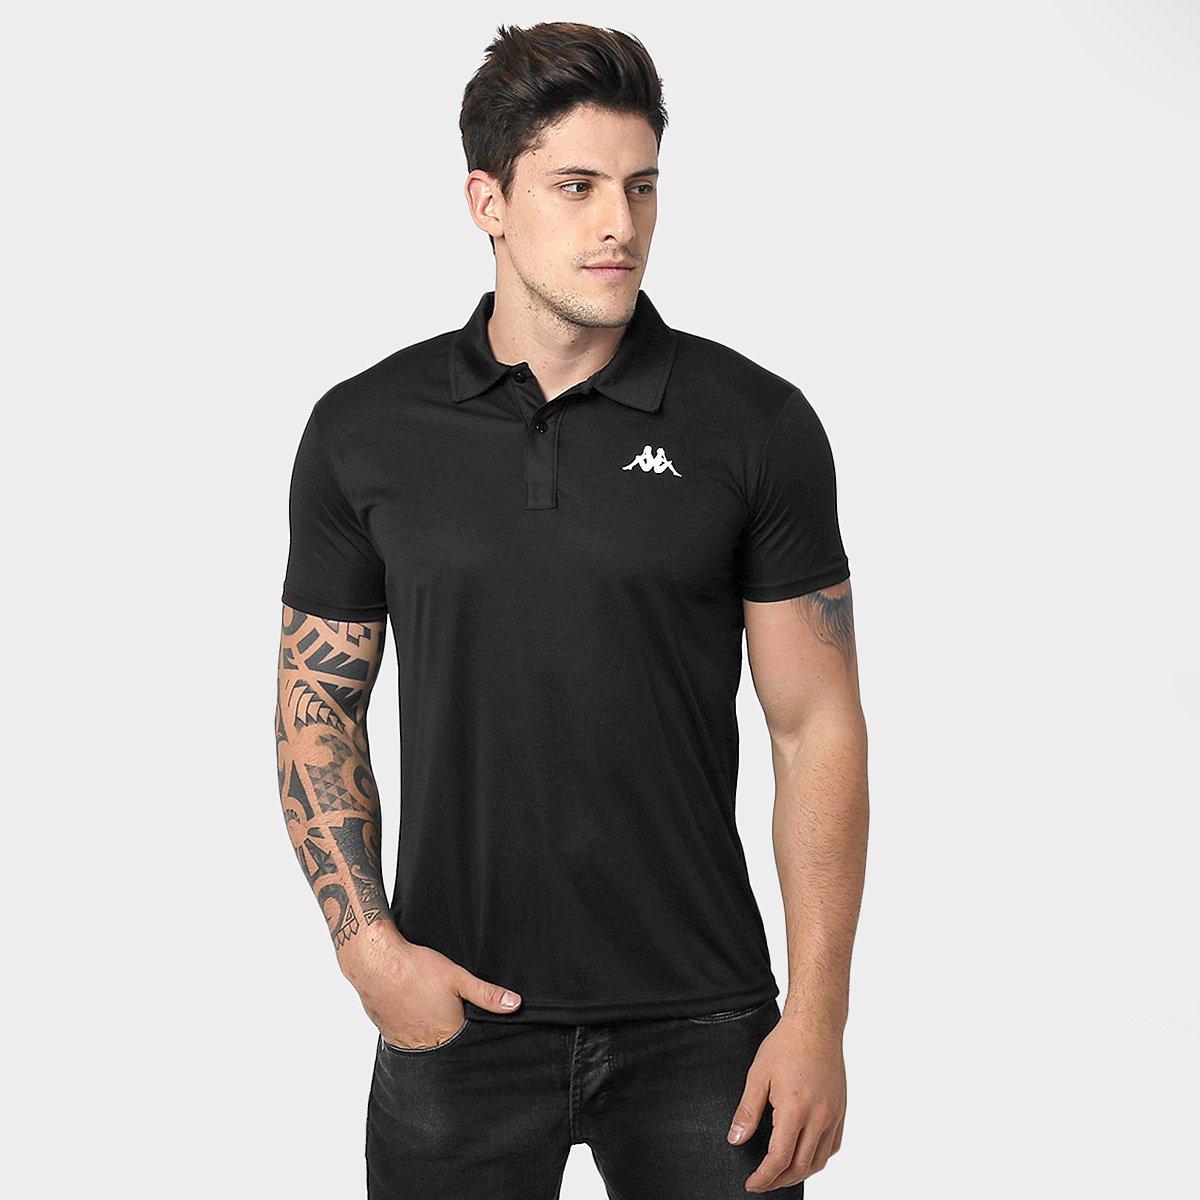 c07c73df38351 Camisa Polo Kappa Sewill Masculina - Compre Agora